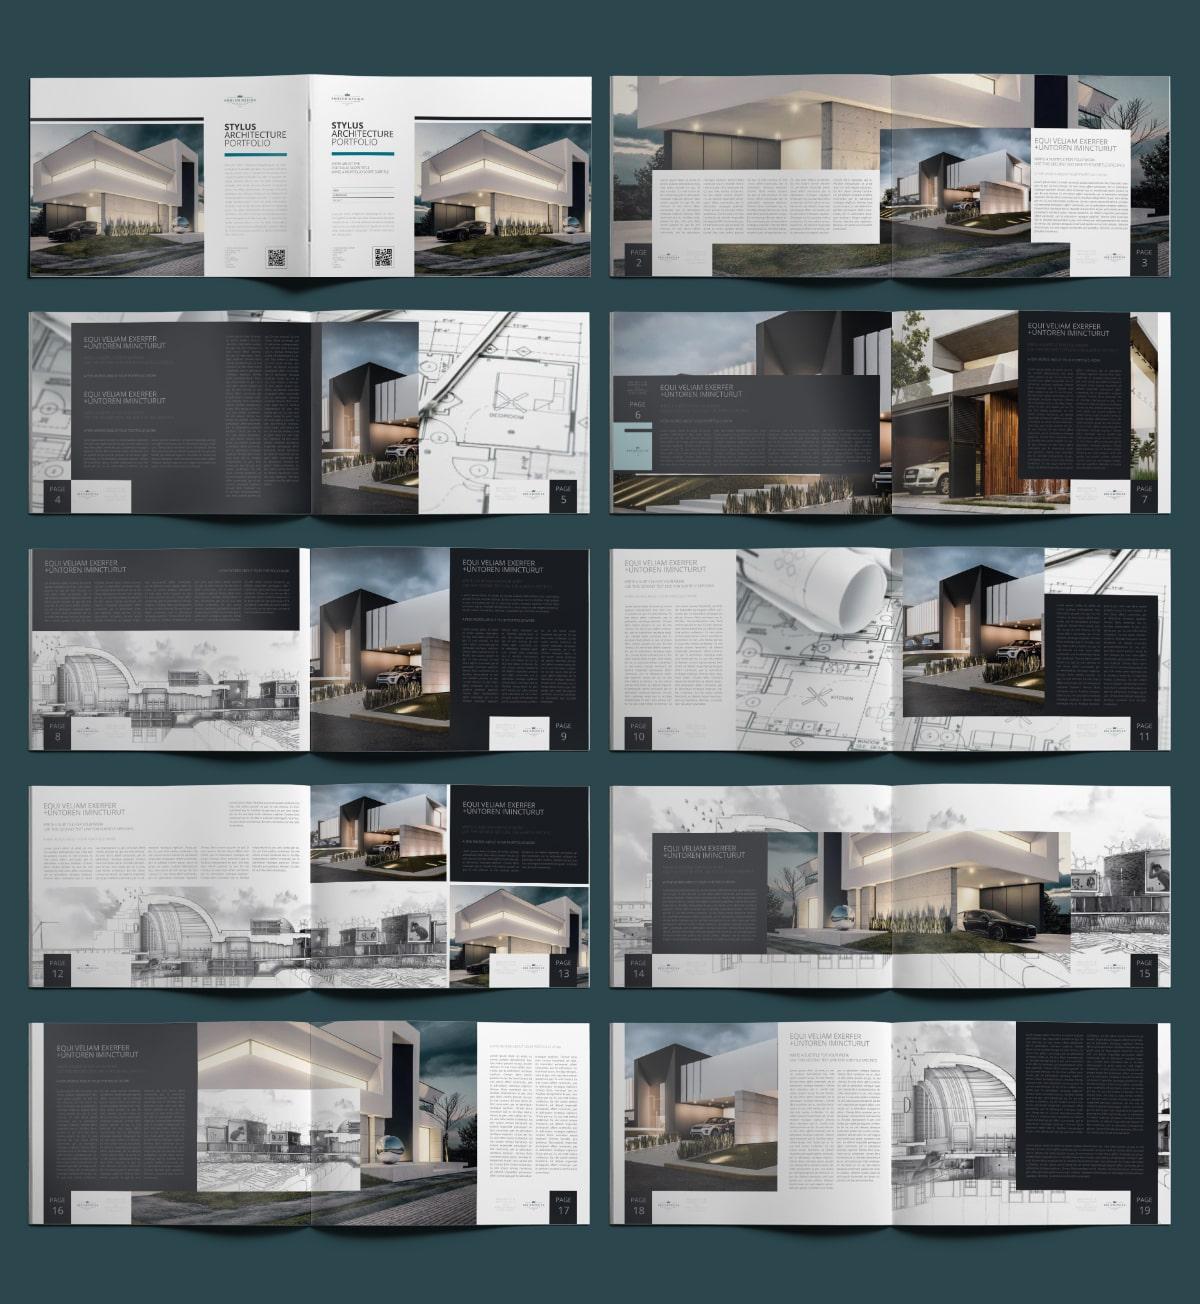 Stylus Architecture Portfolio A4 Landscape - Layouts